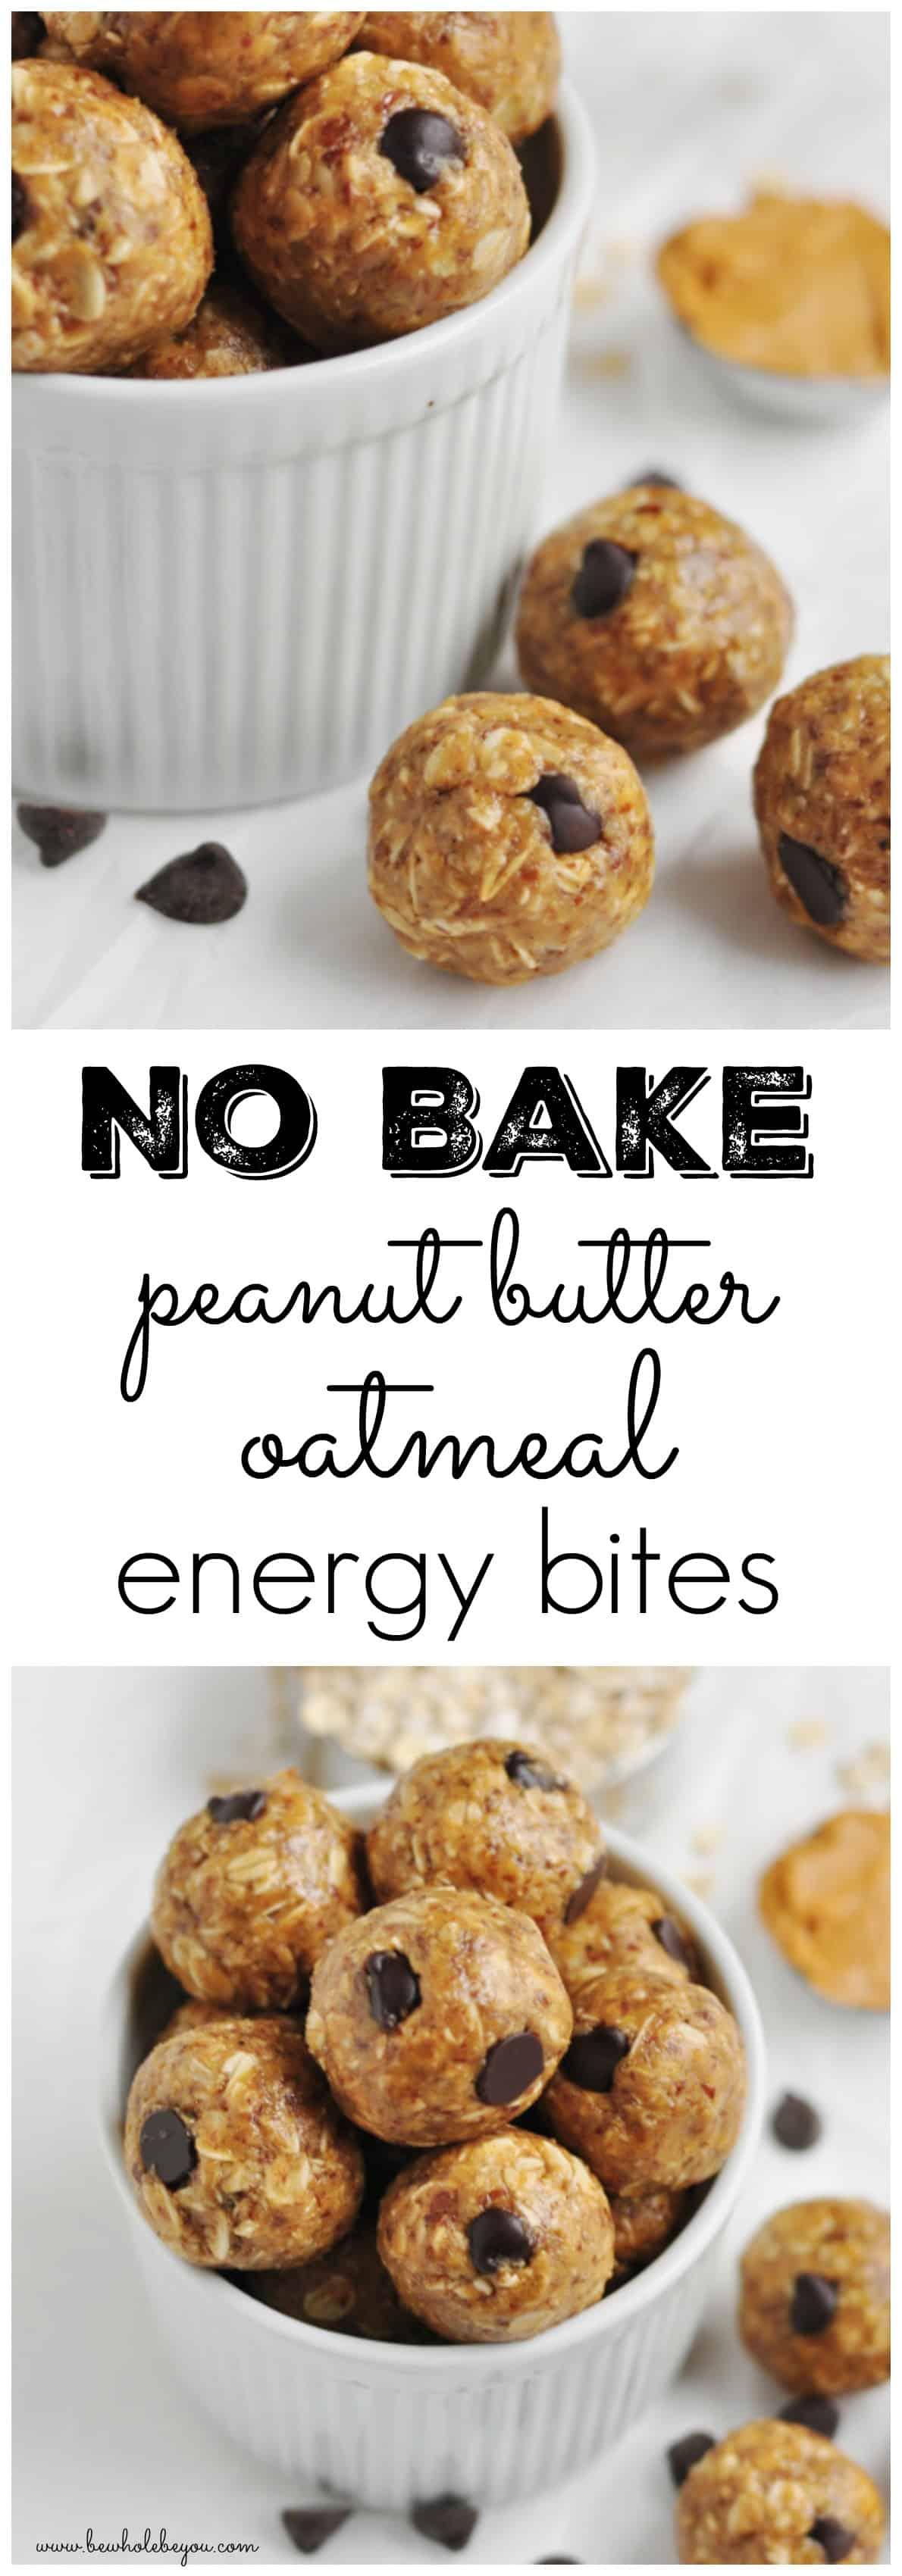 Na Bake Peanut Butter Oatmeal Energy Bites.